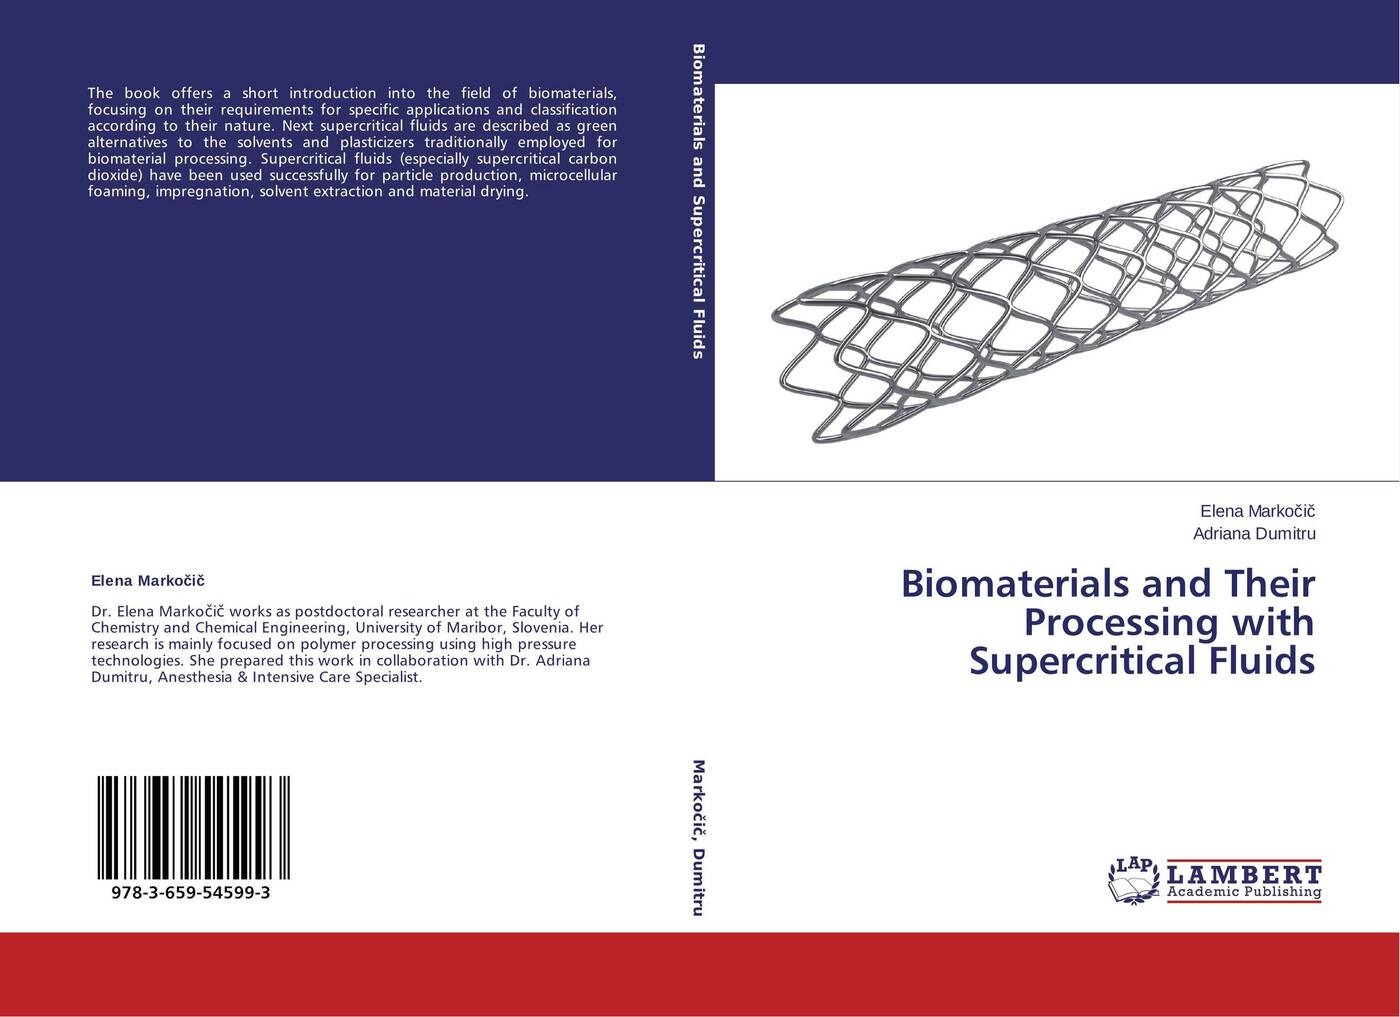 Elena Markočič and Adriana Dumitru Biomaterials and Their Processing with Supercritical Fluids applications of supercritical angle fluorescence